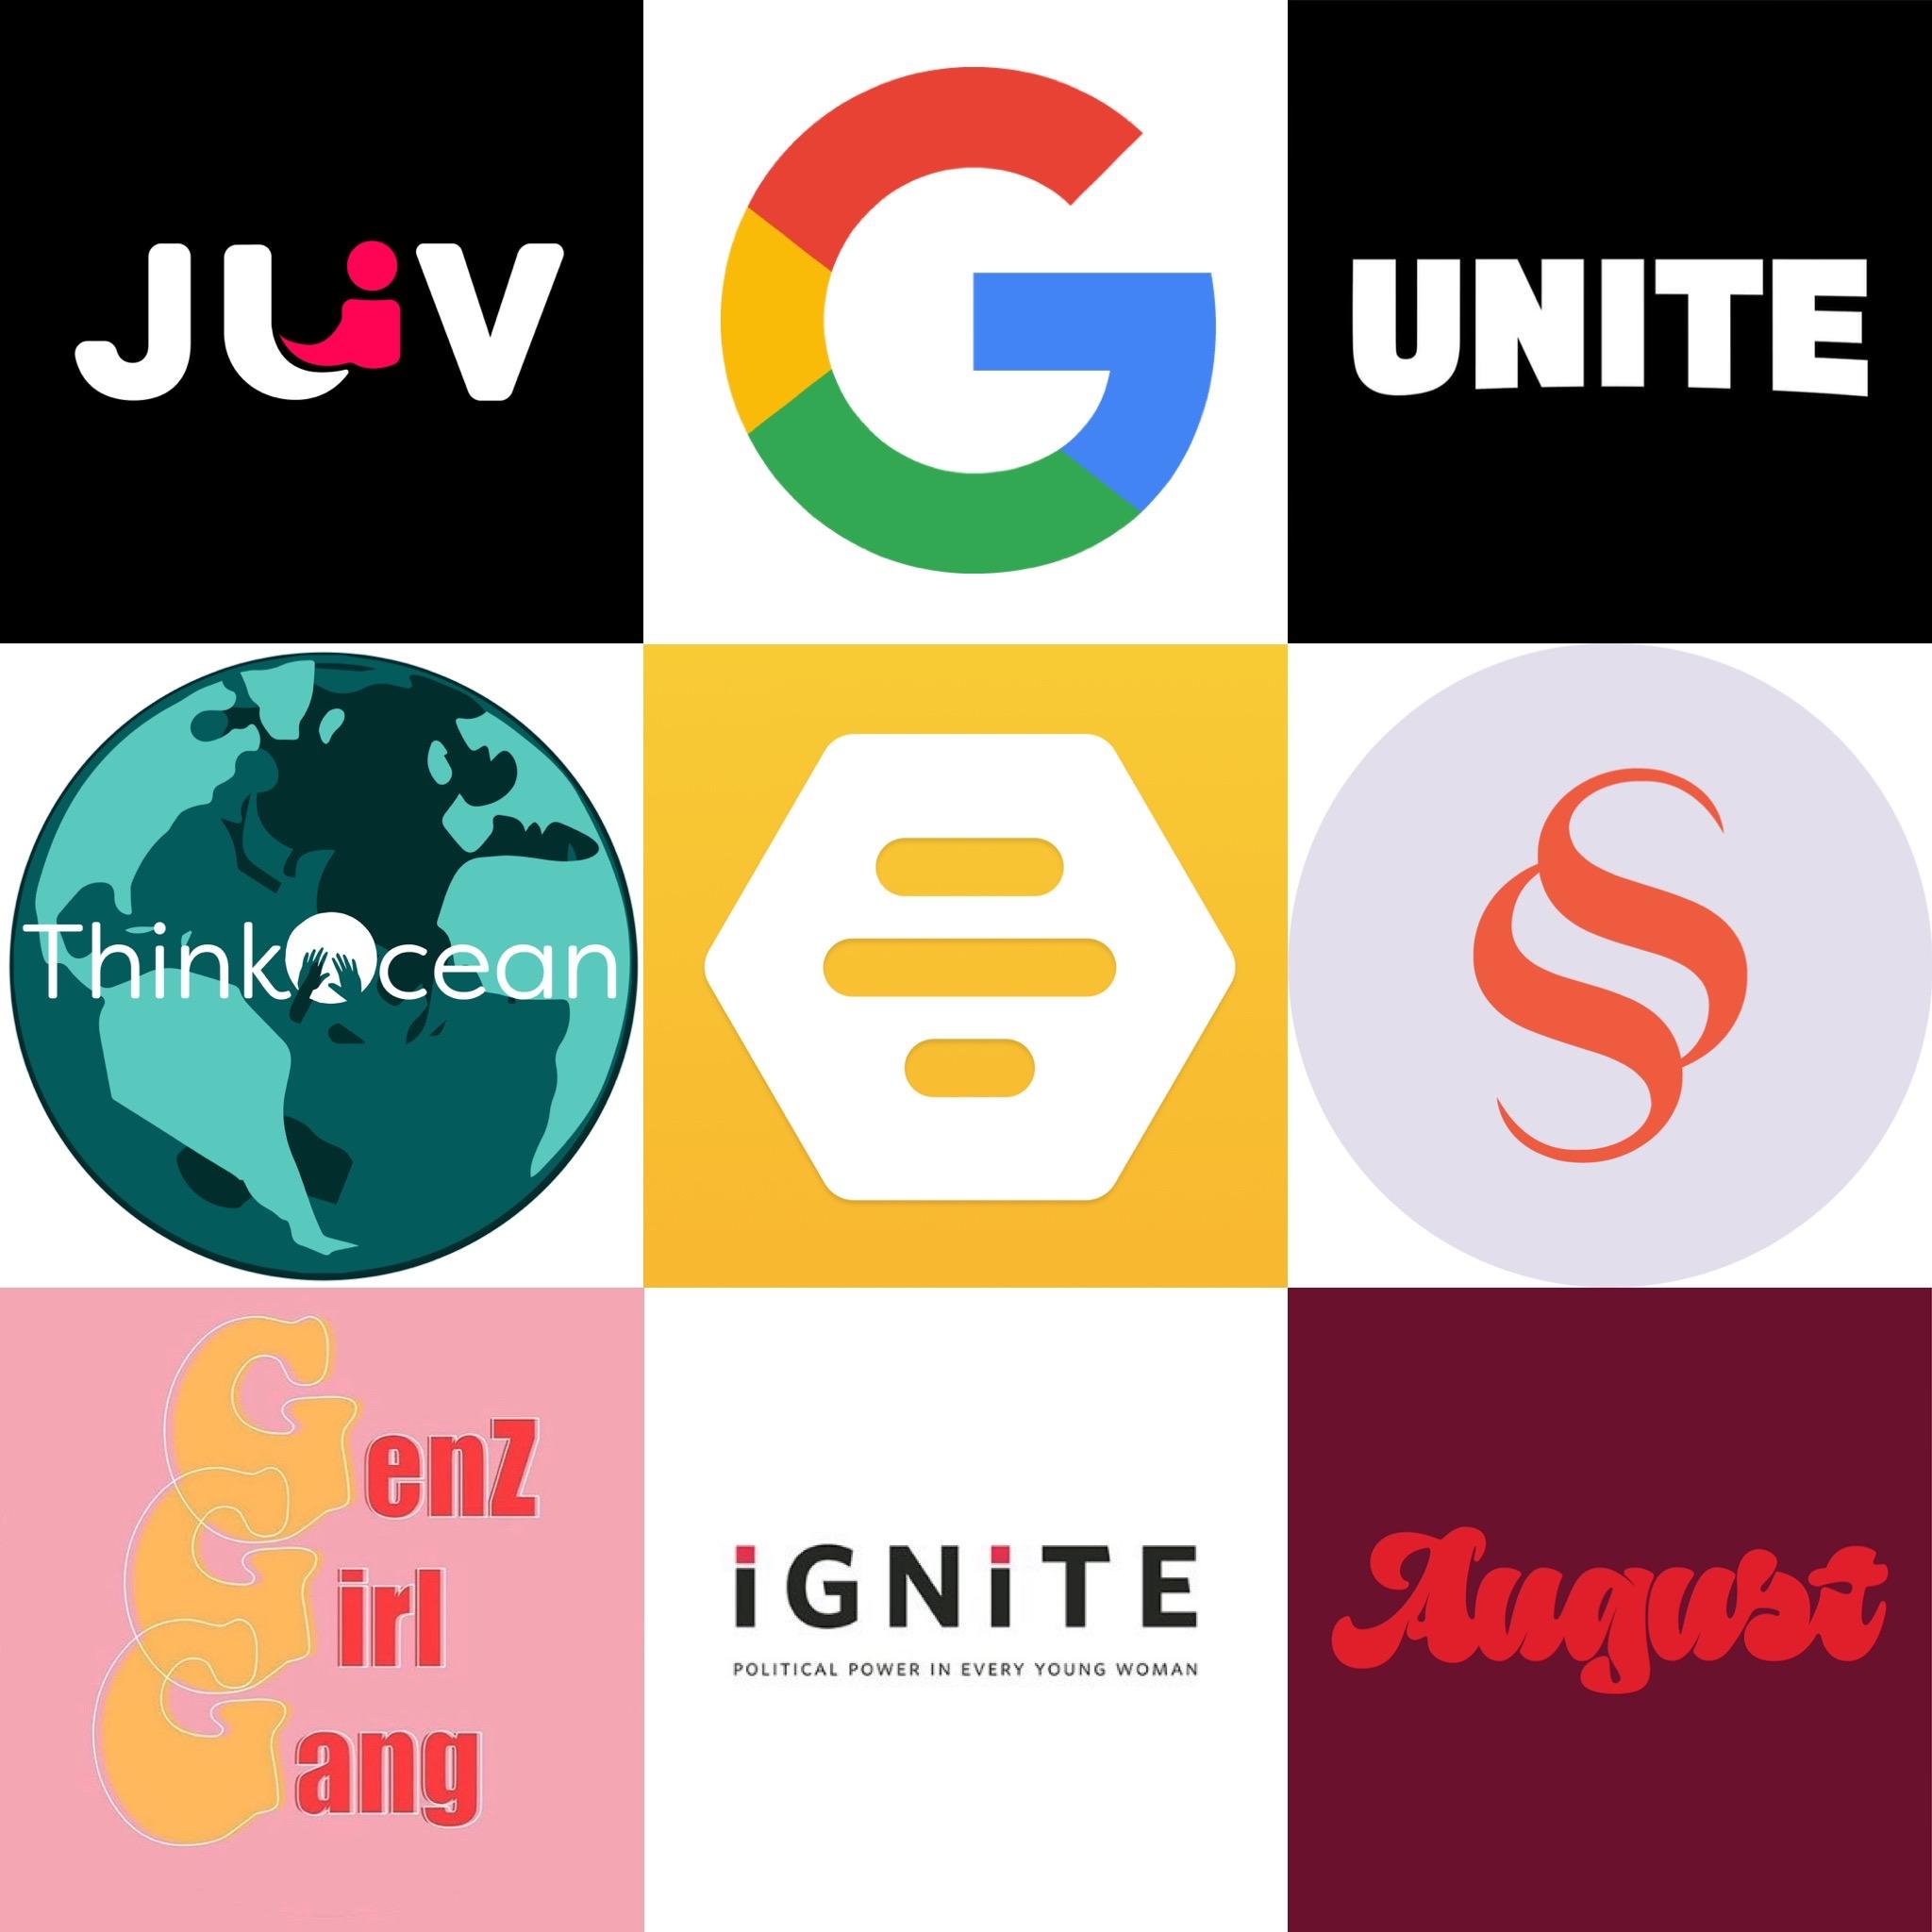 Logos for JUV Consulting, Google, Unite, ThinkOcean, Bumble, Shiffon, GenZ Girl Gang, Ignite, August.